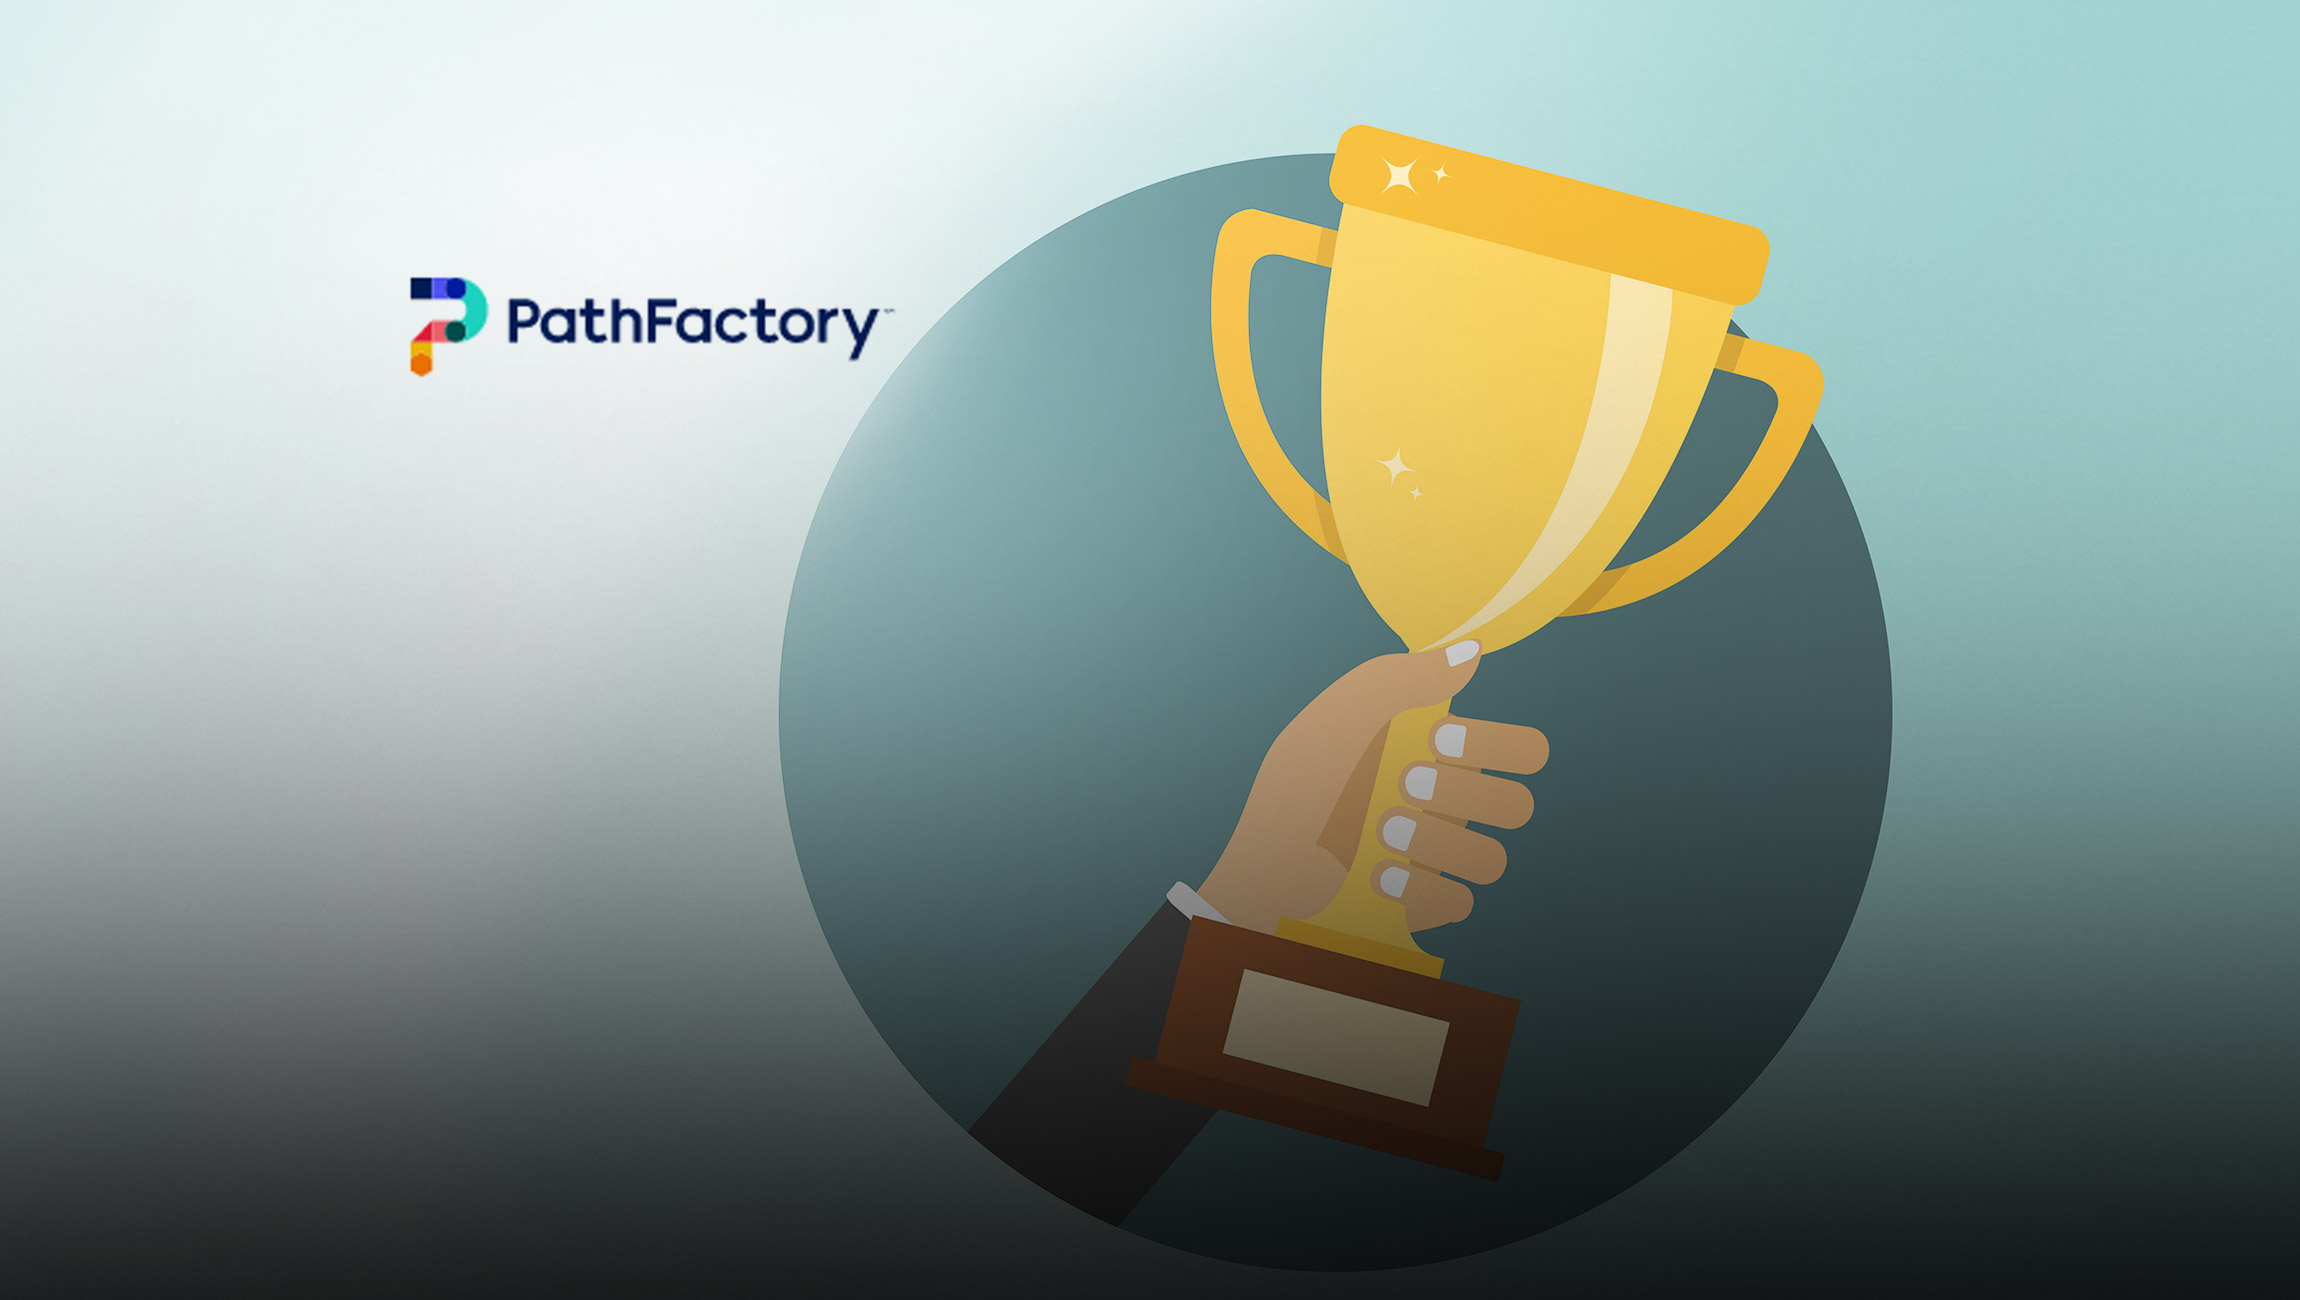 PathFactory Earns A 2020 Tech Cares Award From TrustRadius